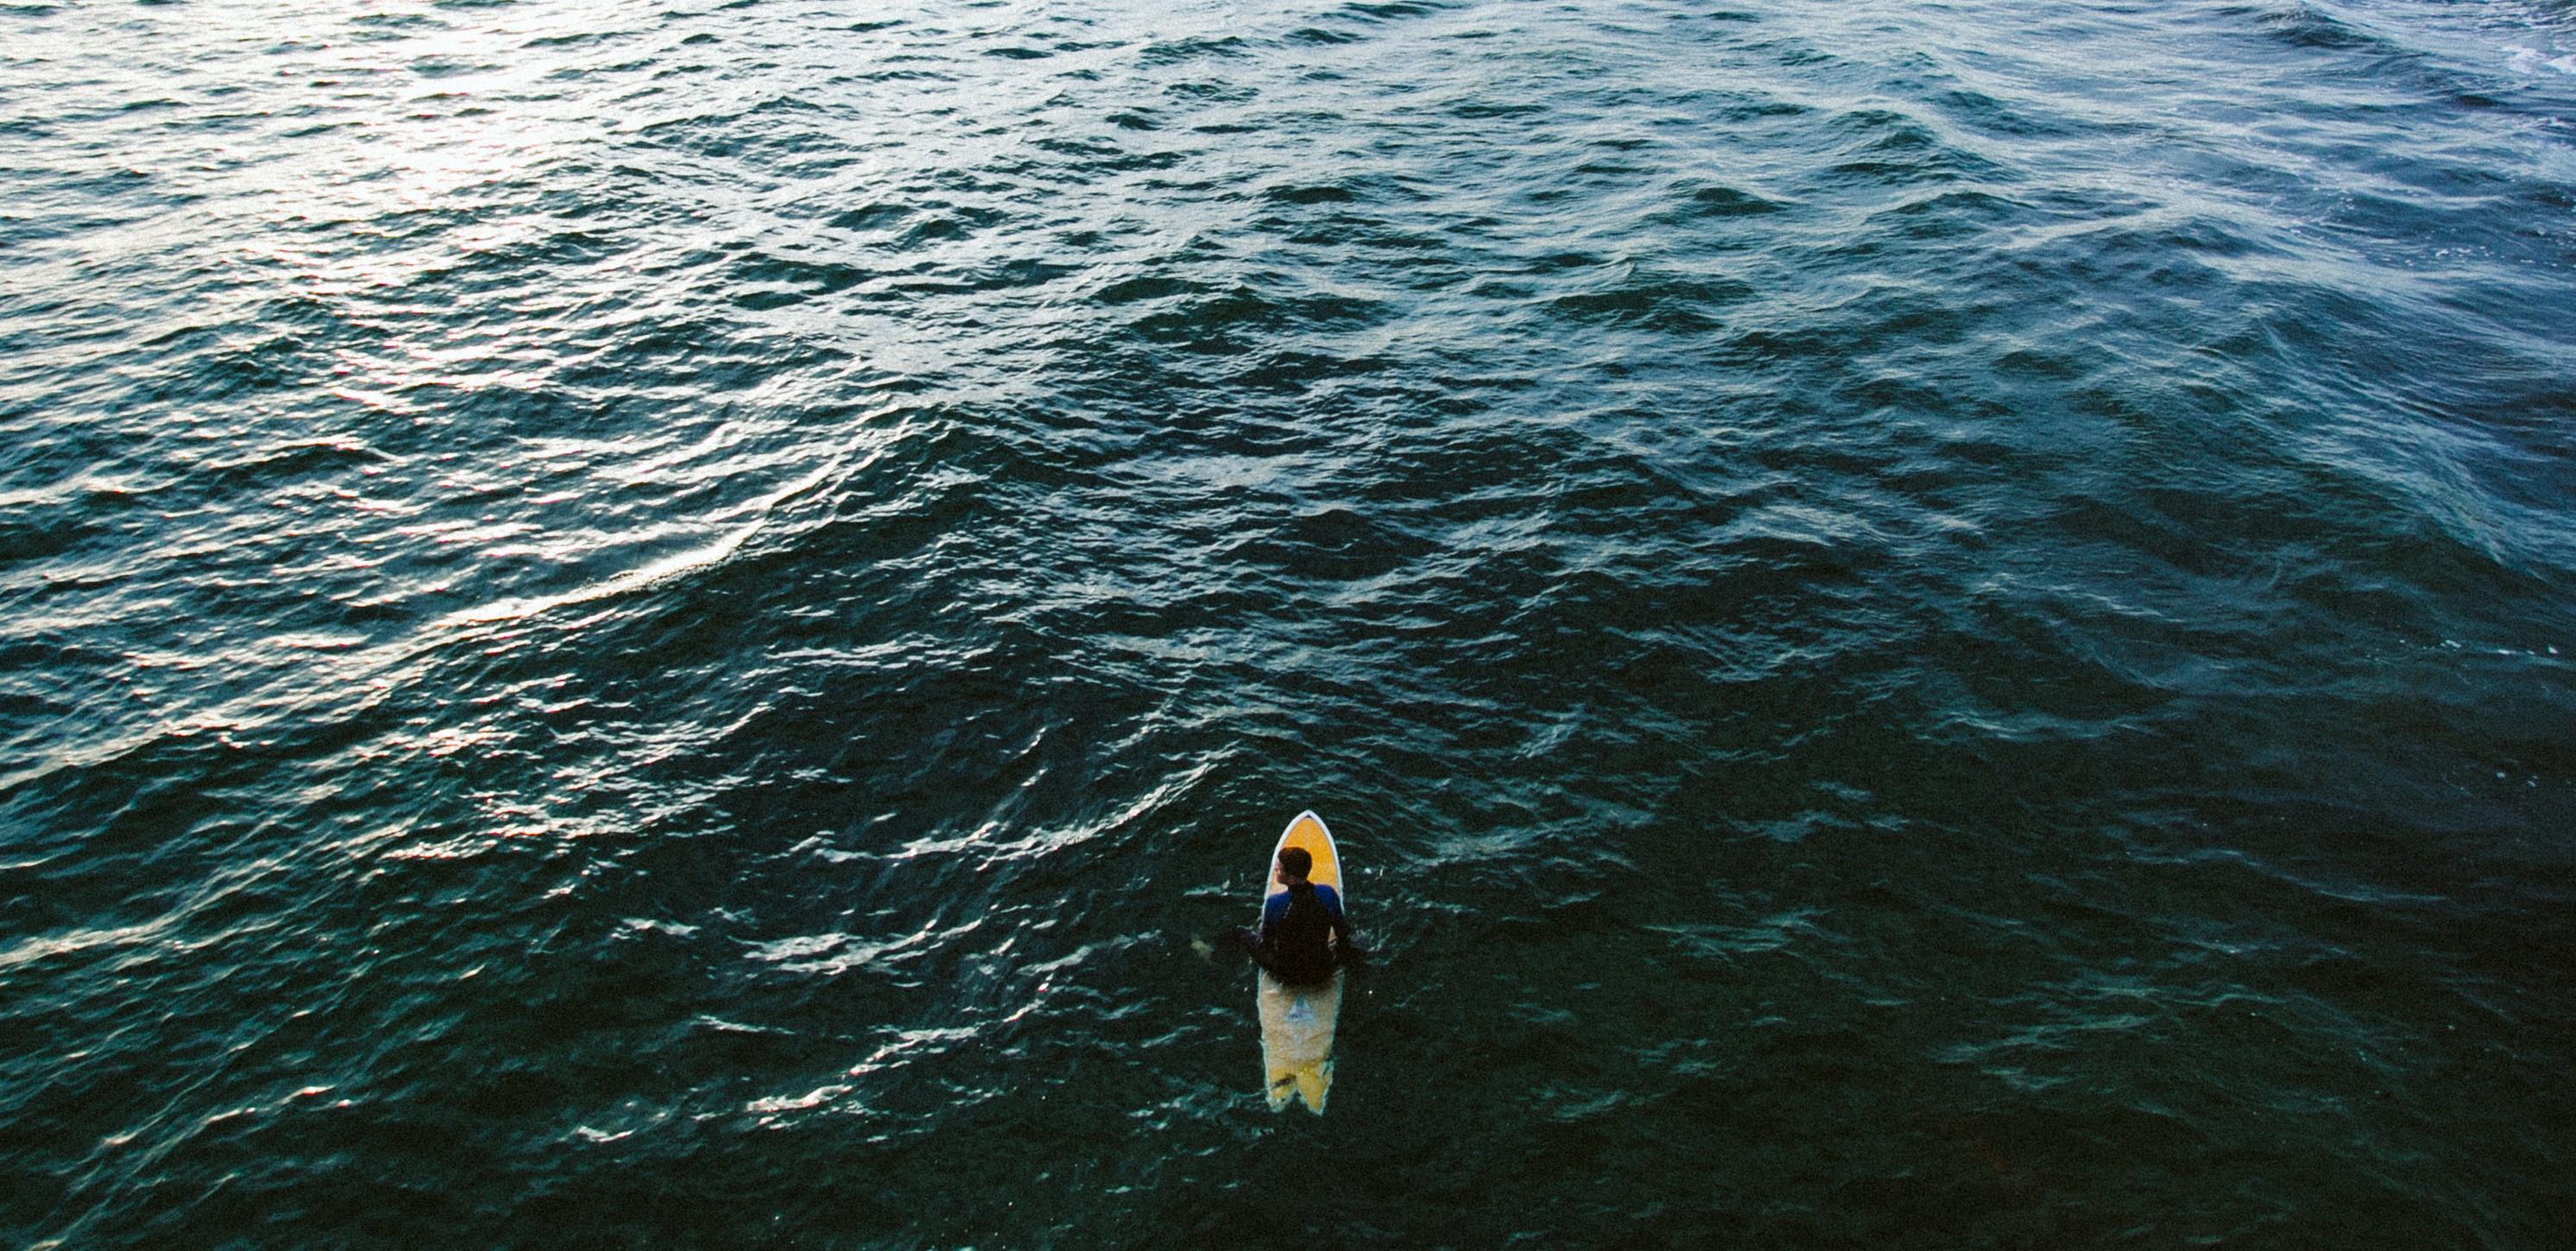 Ryan Longnecker, travel photographer, freelance, branding, landscape, photography, portraits, fashion